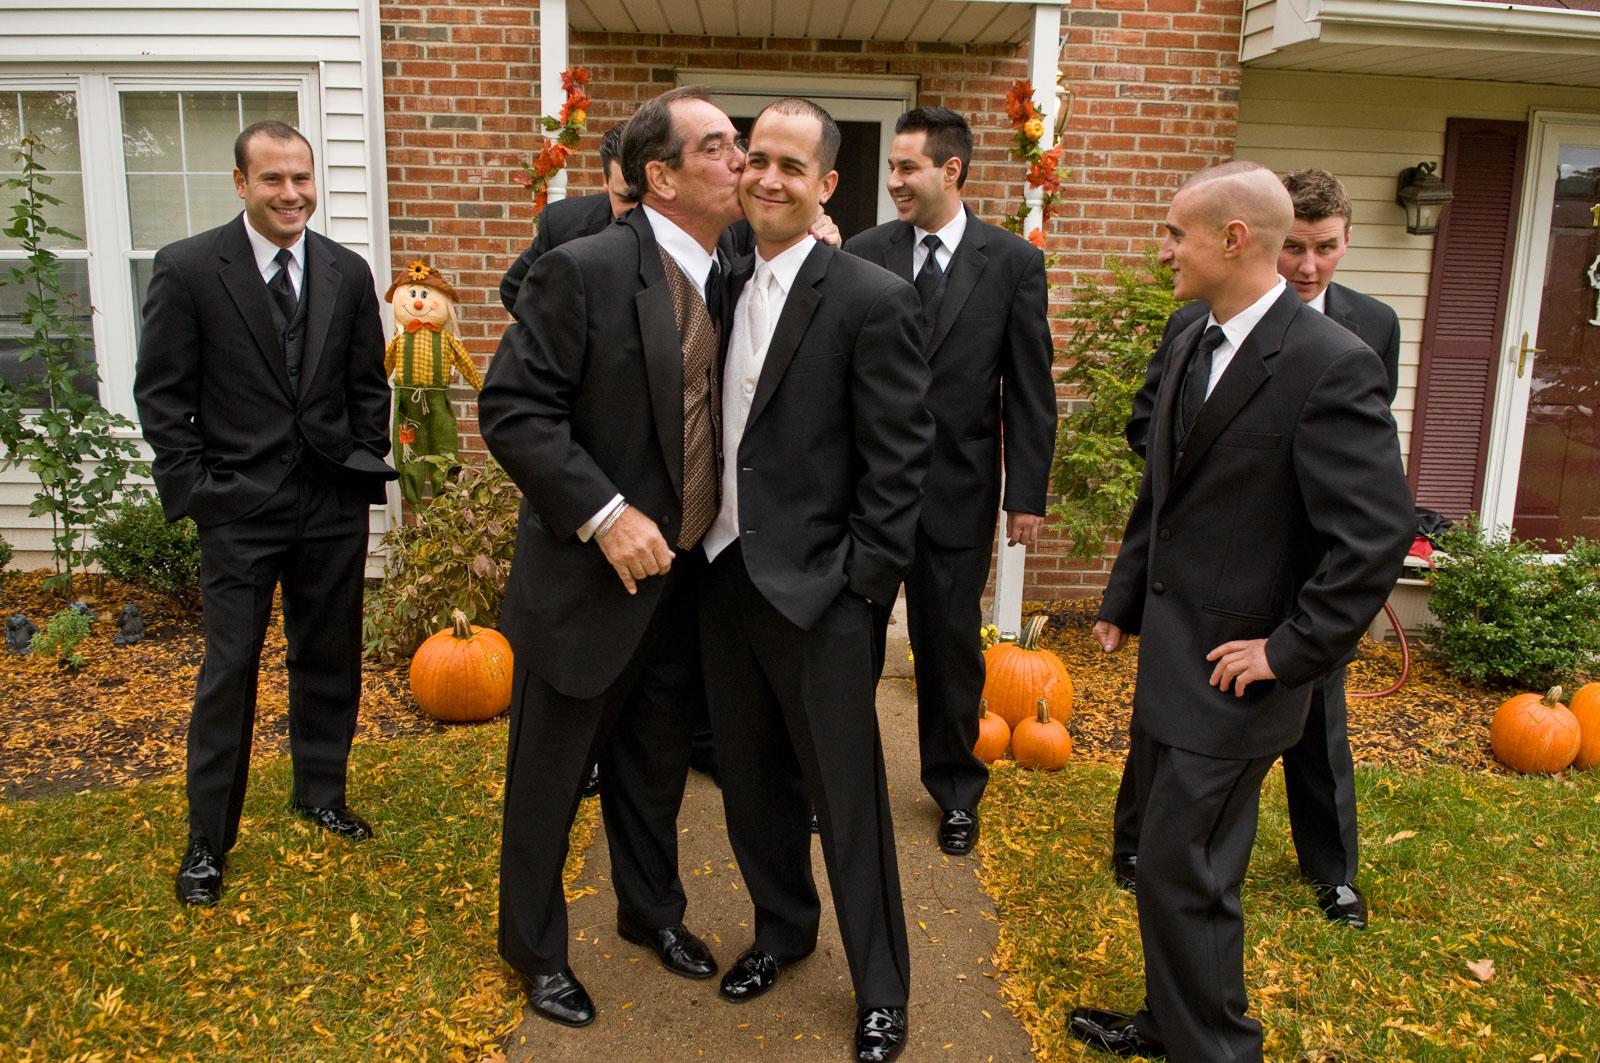 Wedding016__DSC5674.jpg